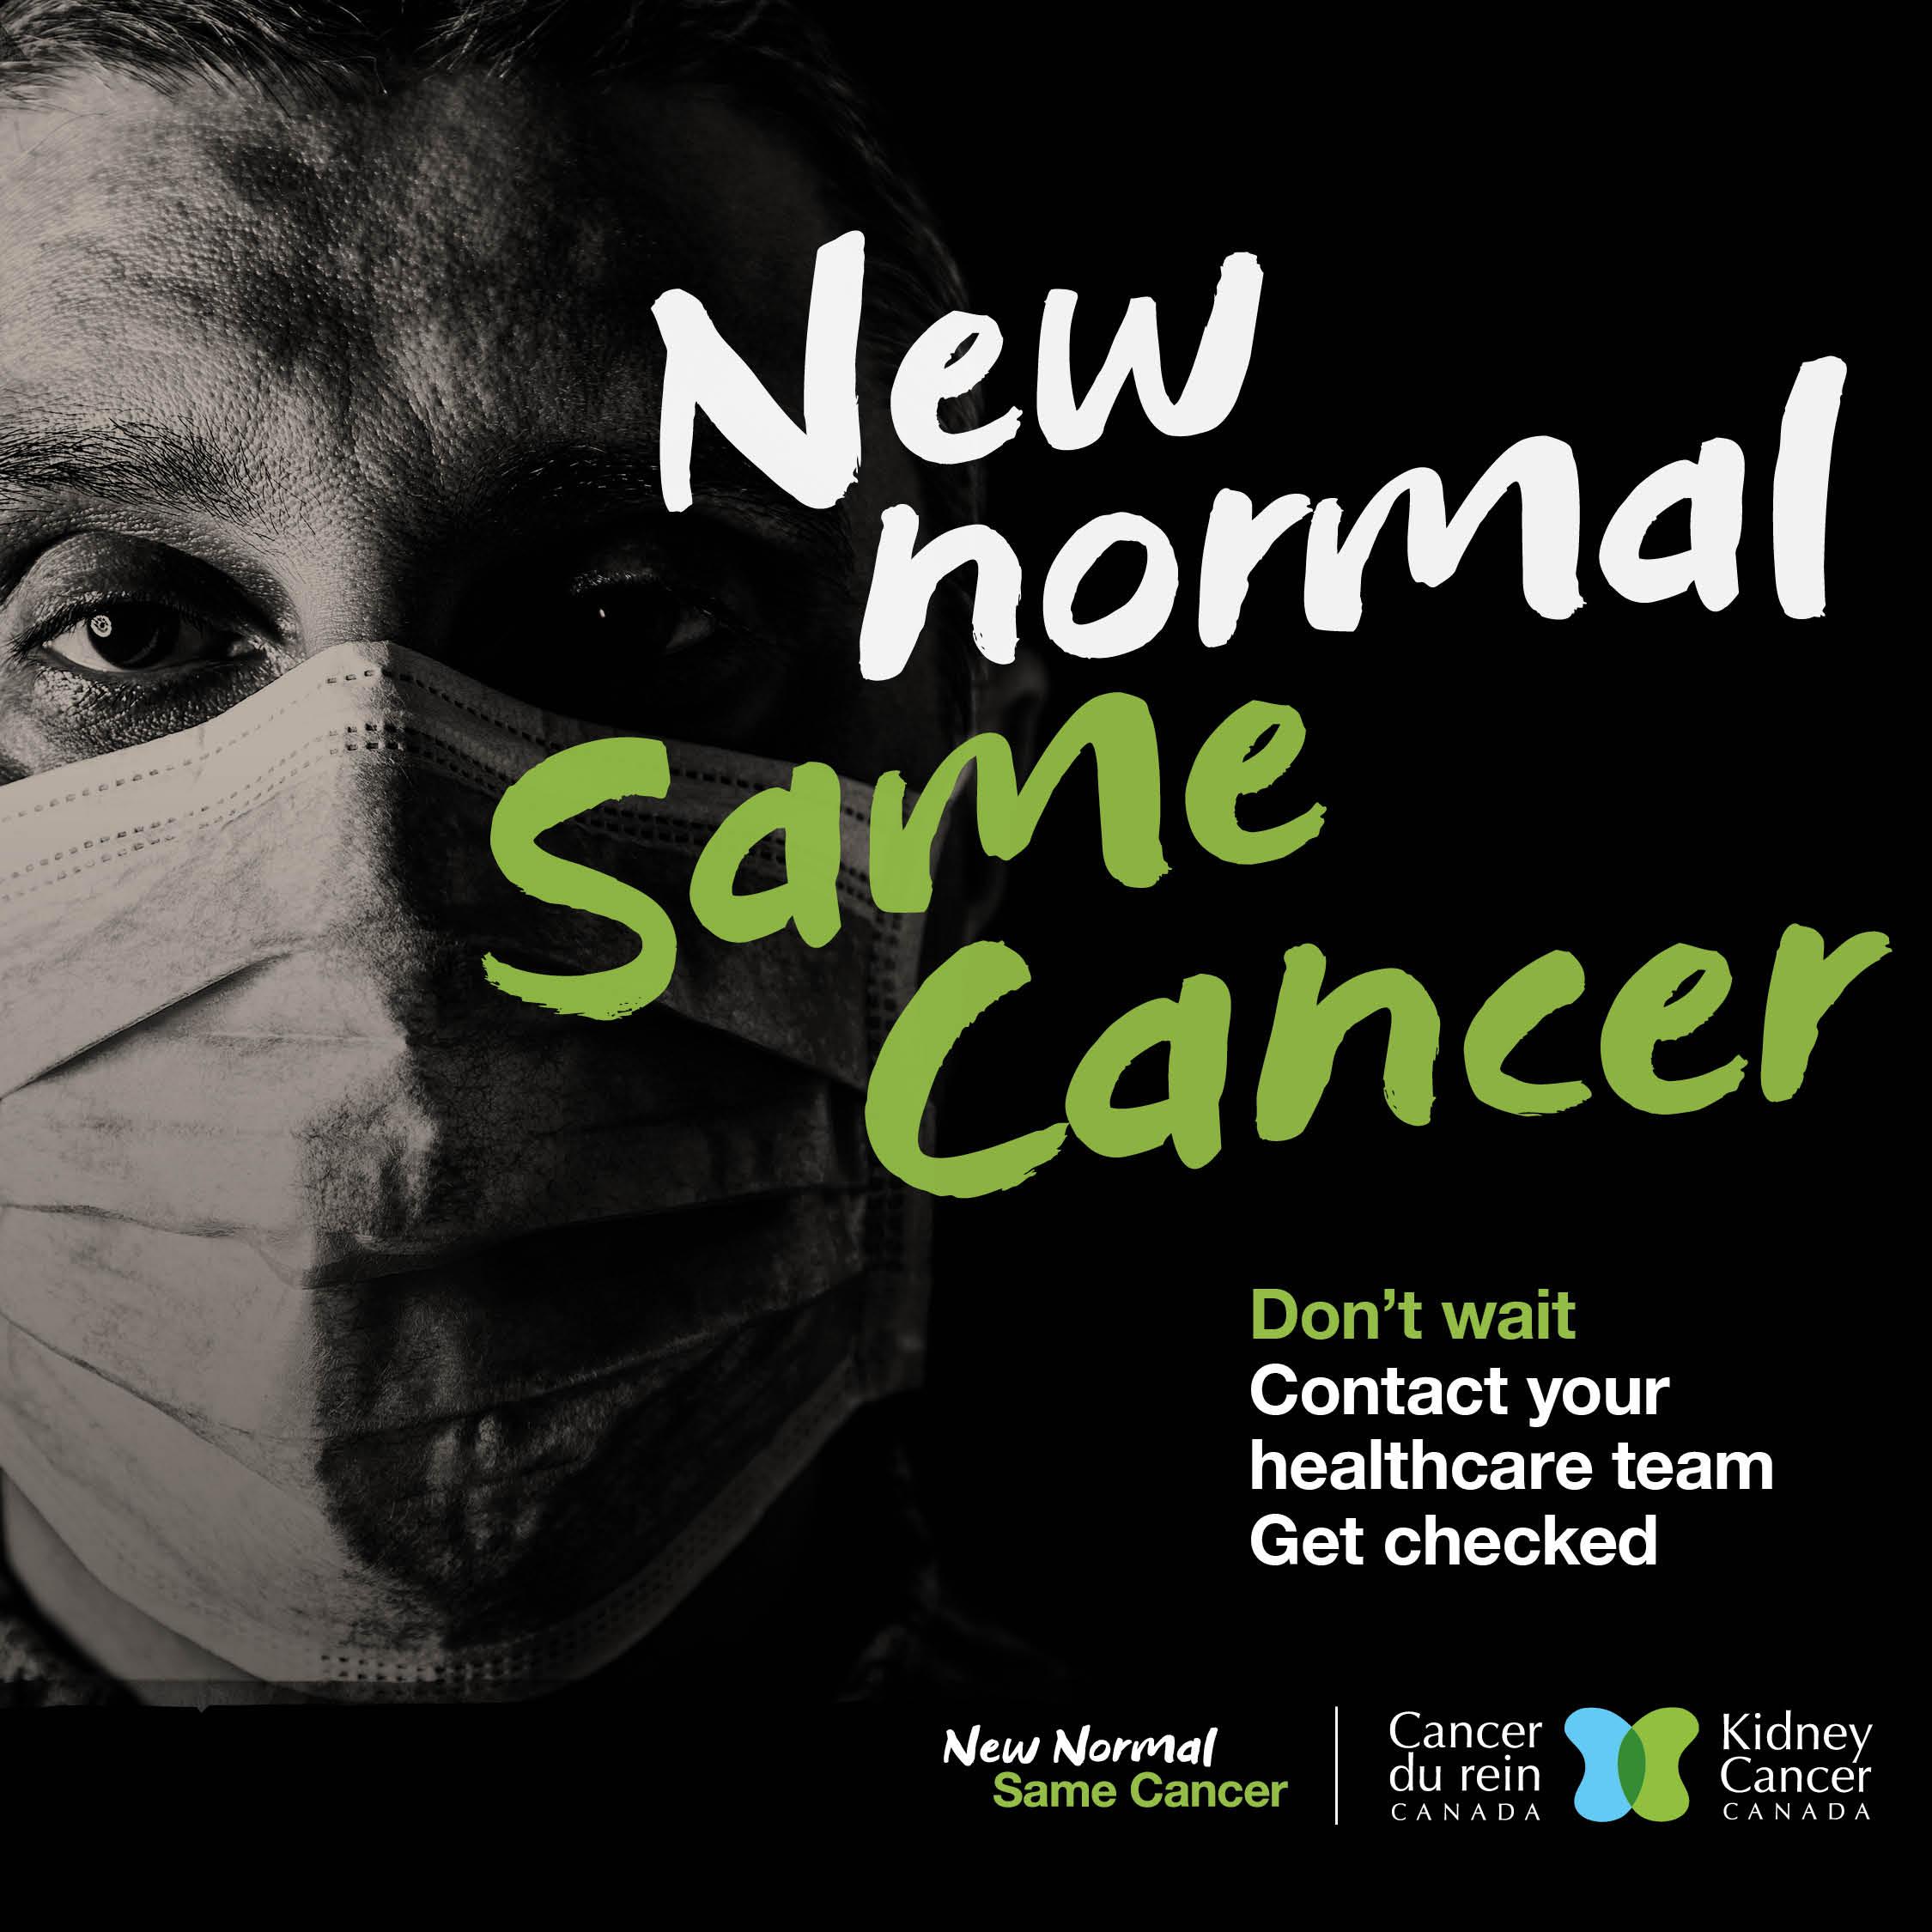 New Normal Same Cancer